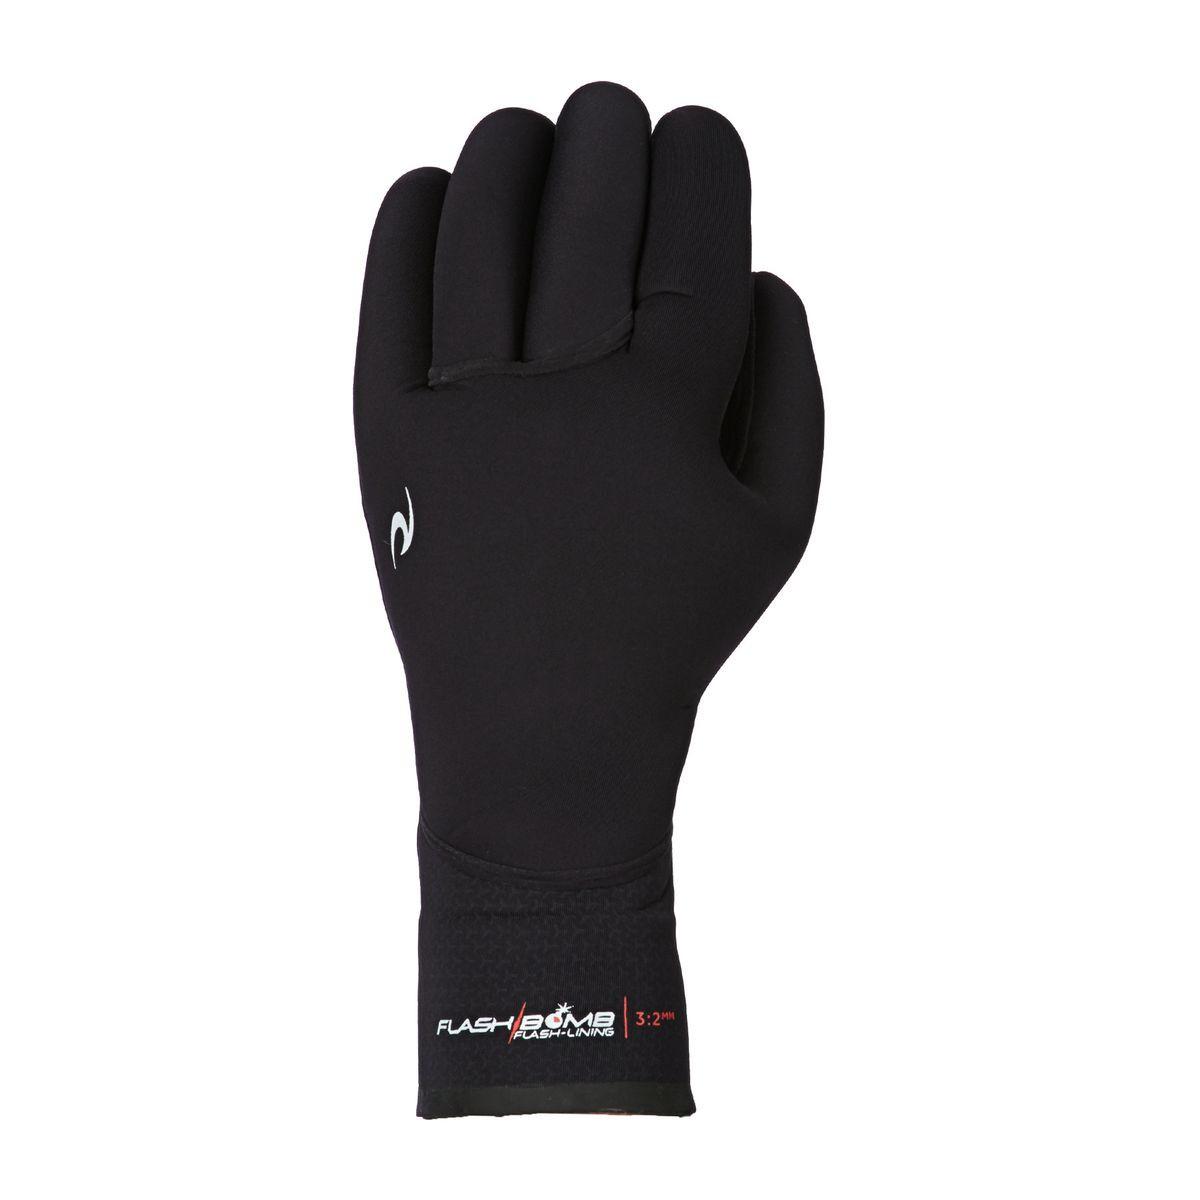 Rip Curl Flashbomb 3/2mm 5 Finger Wetsuit Gloves - Black